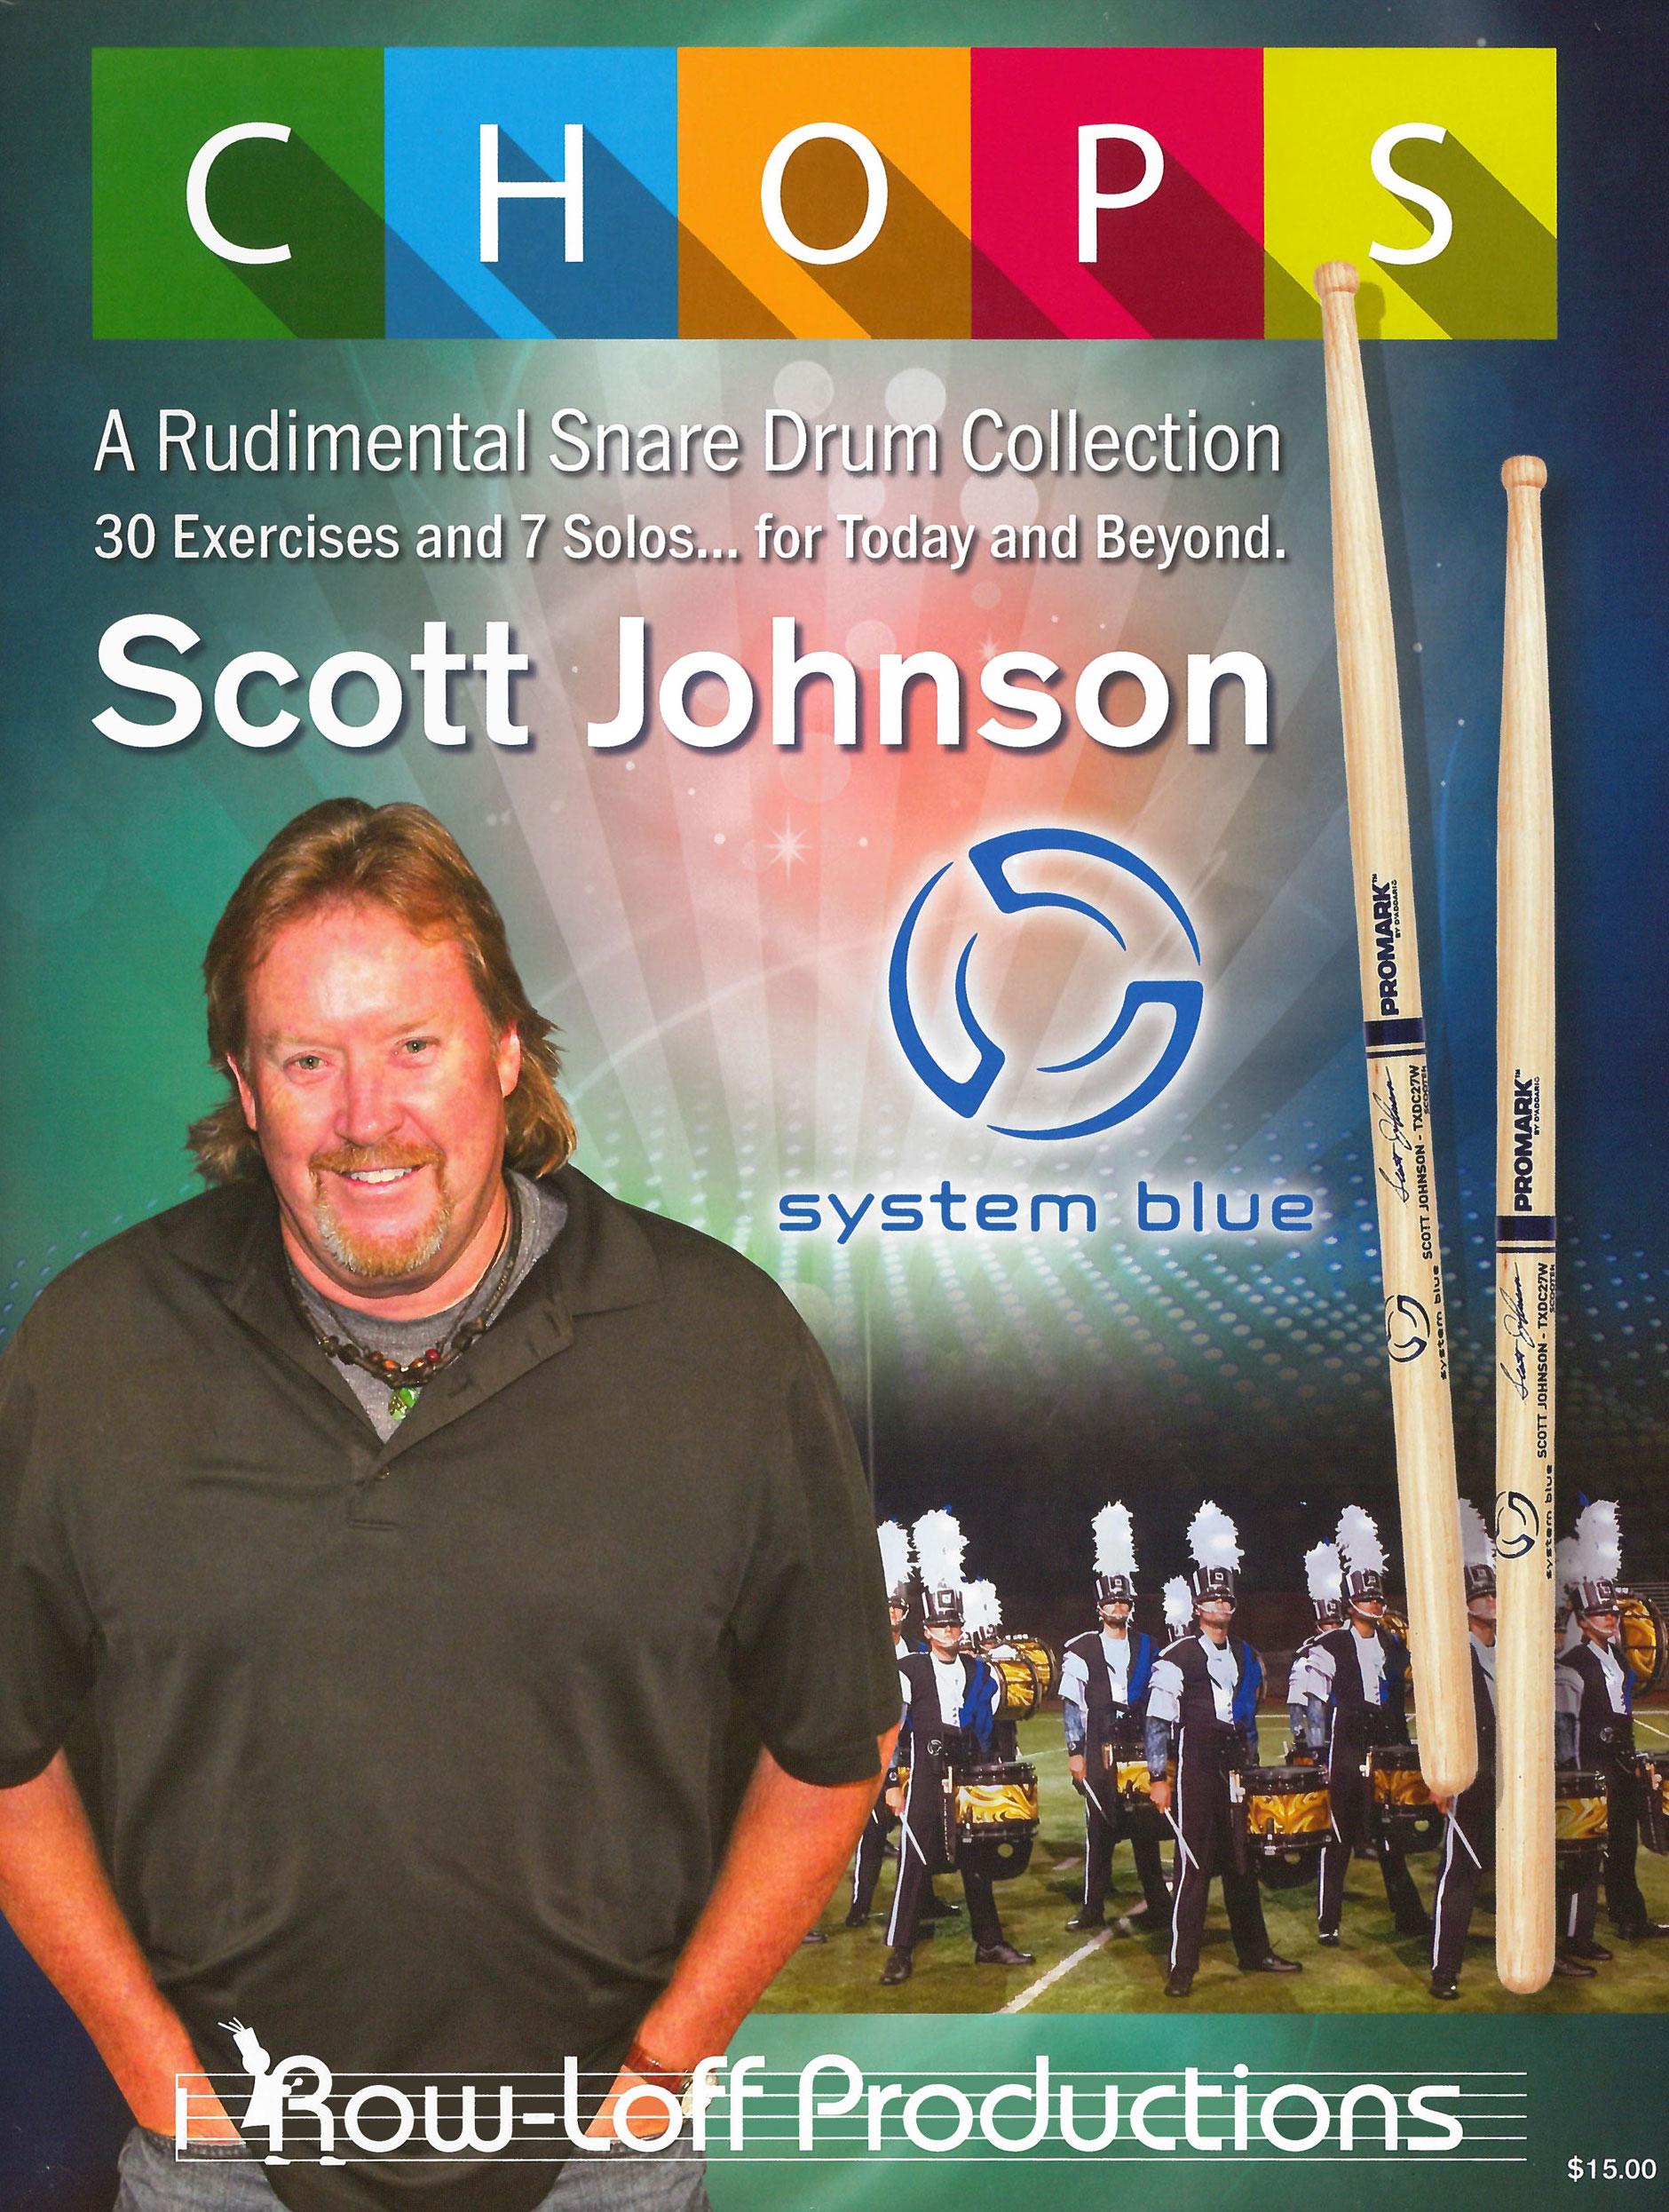 Chops- by Scott Johnson, Rowloff Publishing